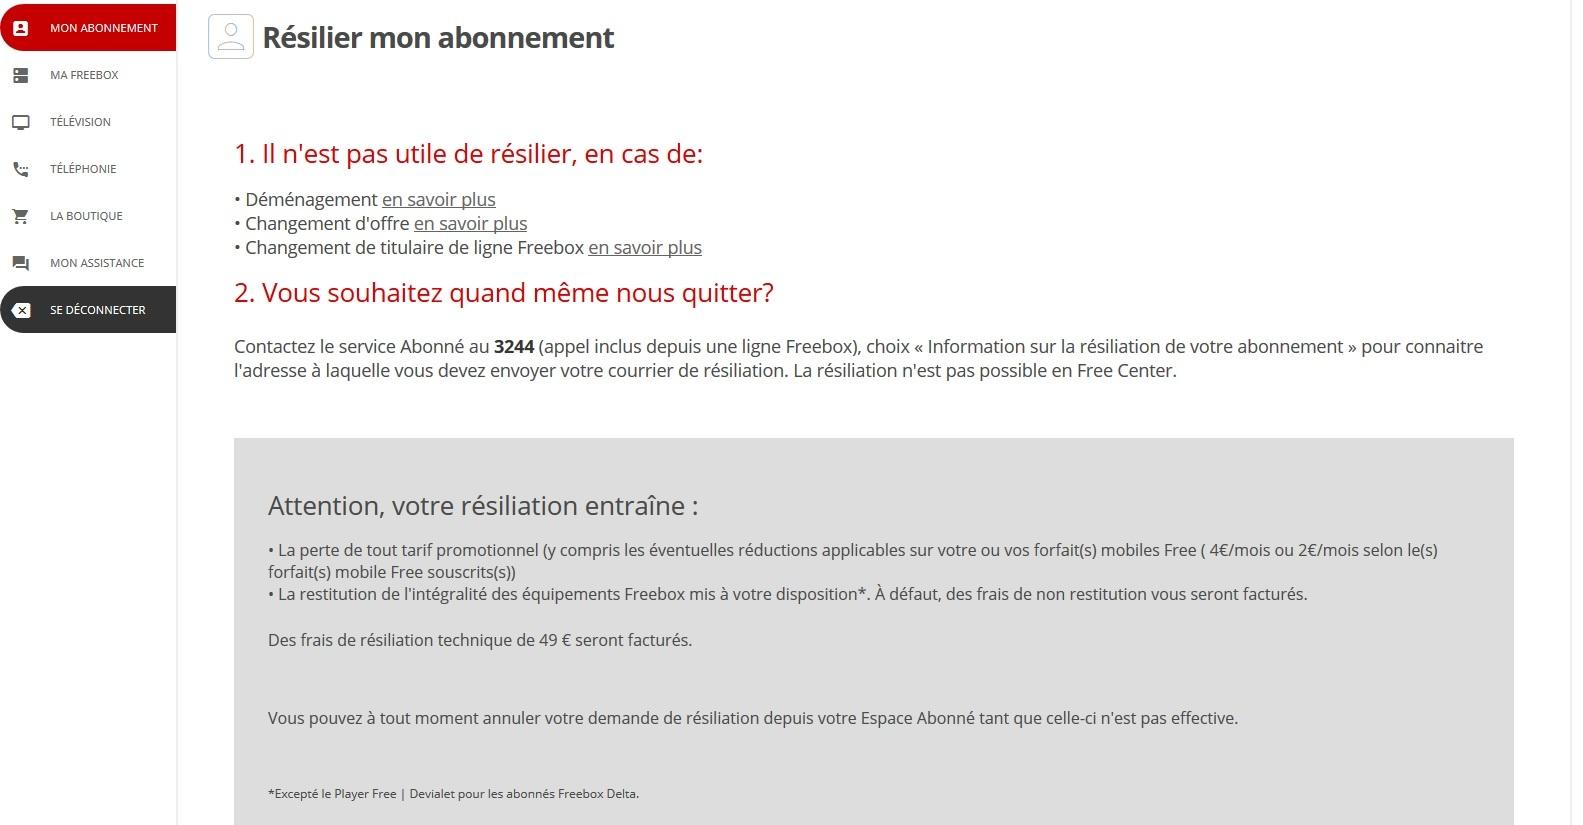 Free Complexifie Sa Demarche De Resiliation Frandroid